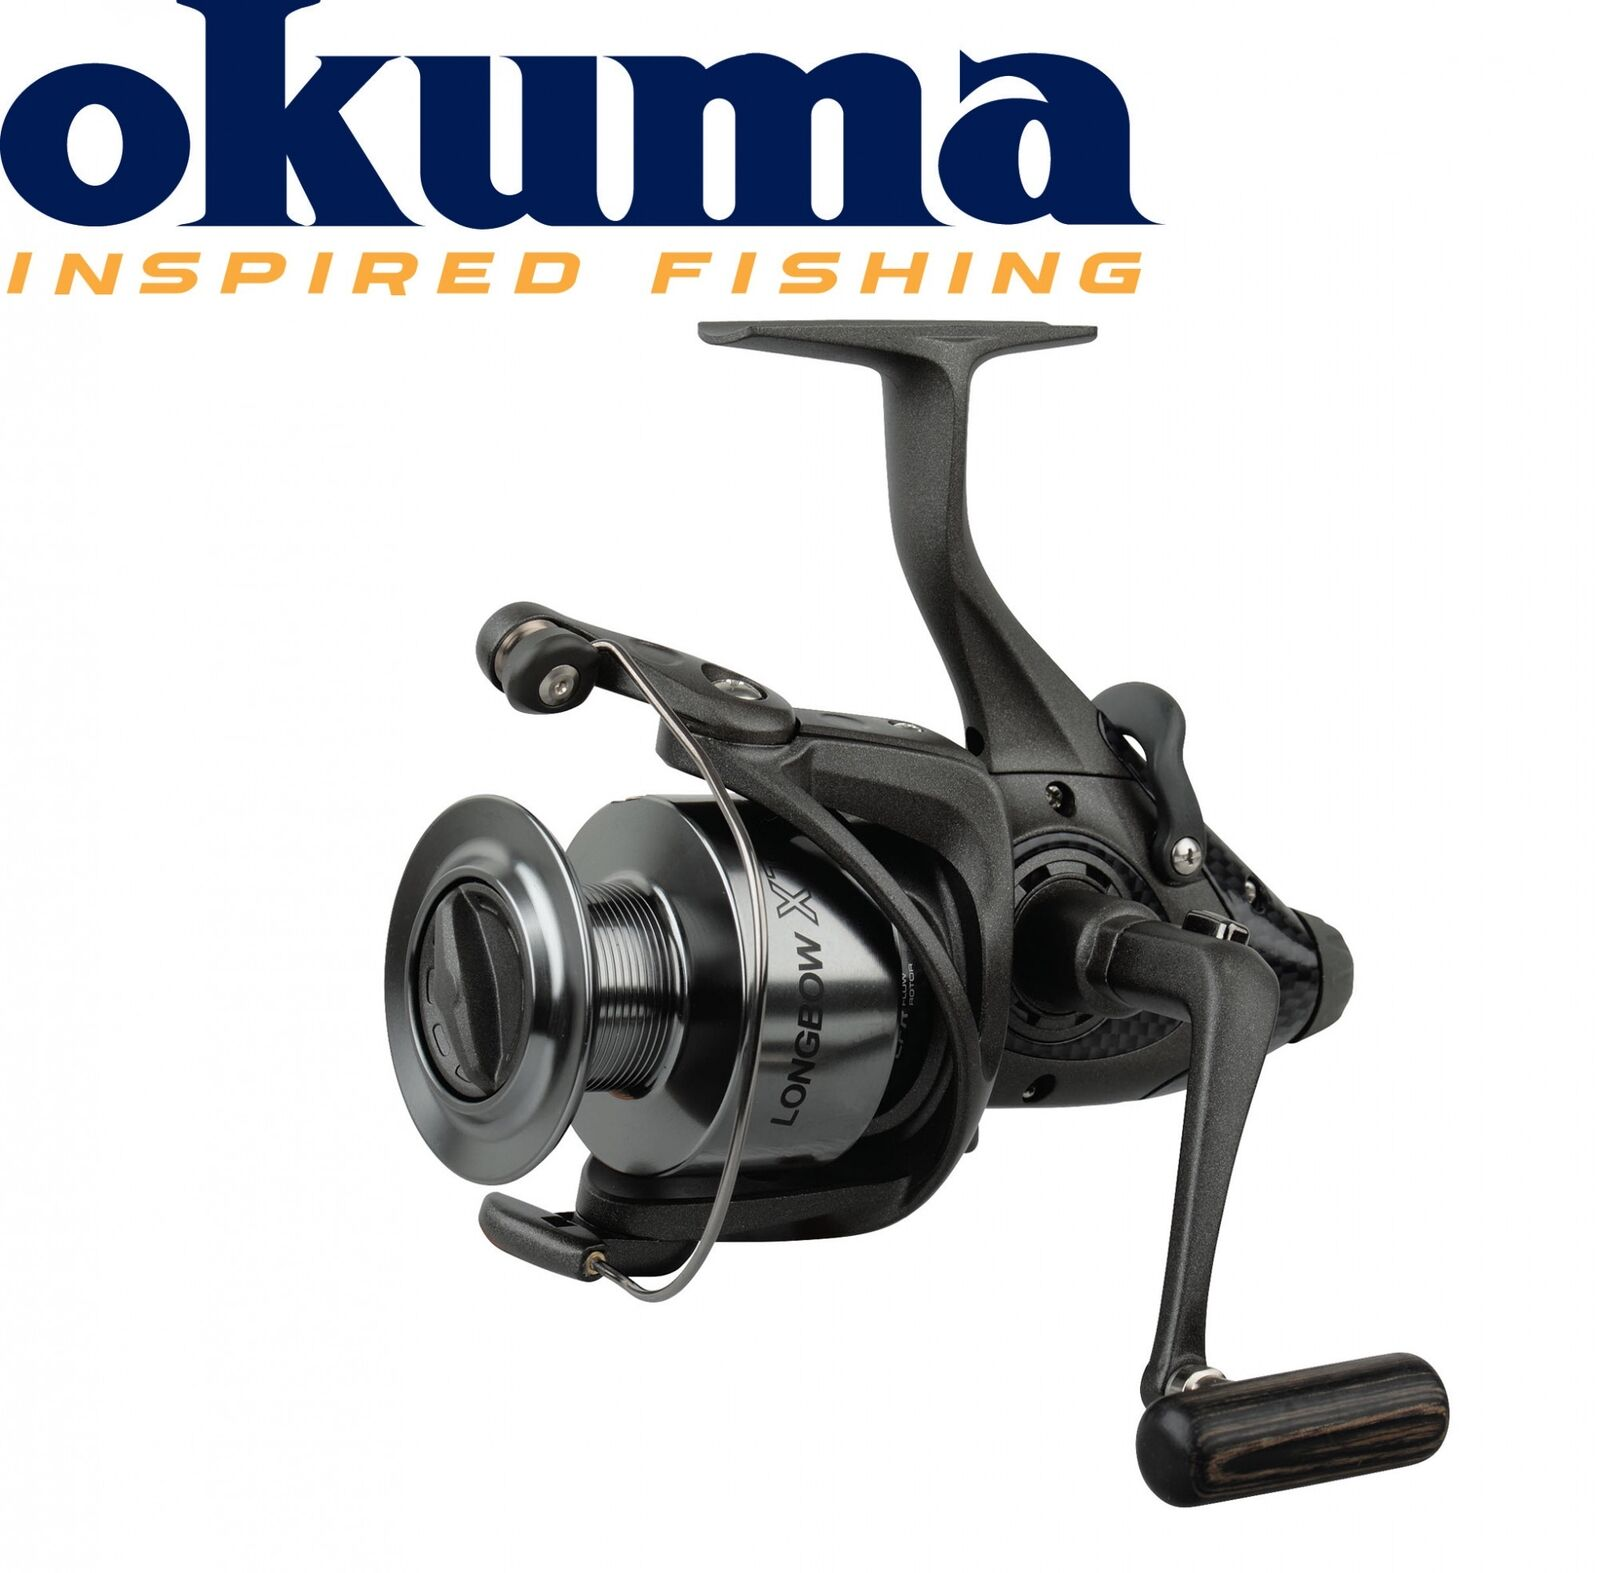 Okuma Longbow XT Baitfeeder 630– 200m 0,20mm Schnurfassung Freilaufrolle Freilaufrolle Freilaufrolle f646b2